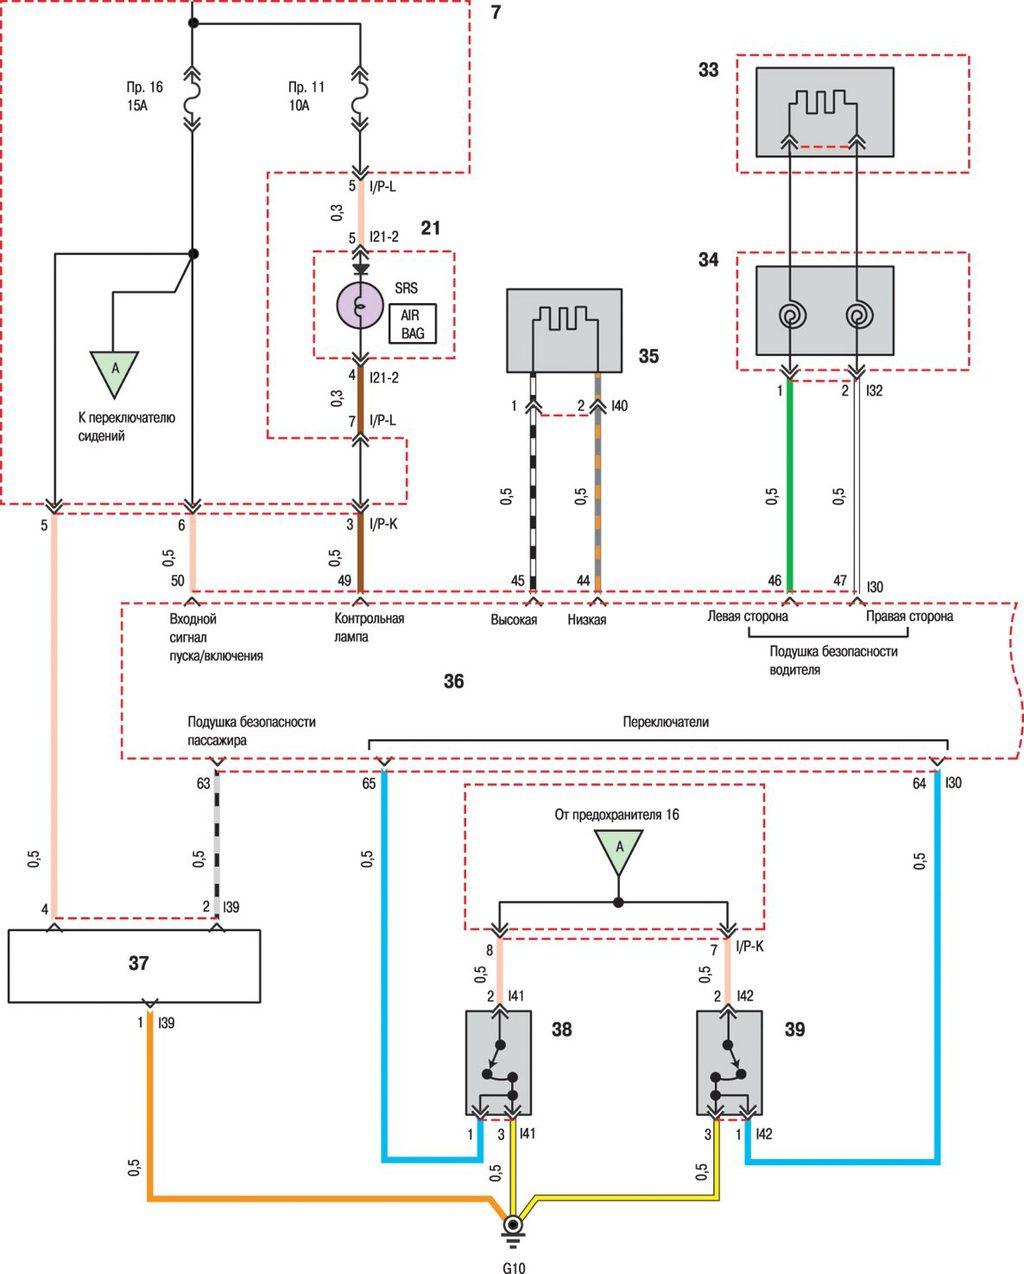 Схема электрооборудования хендай соната фото 628